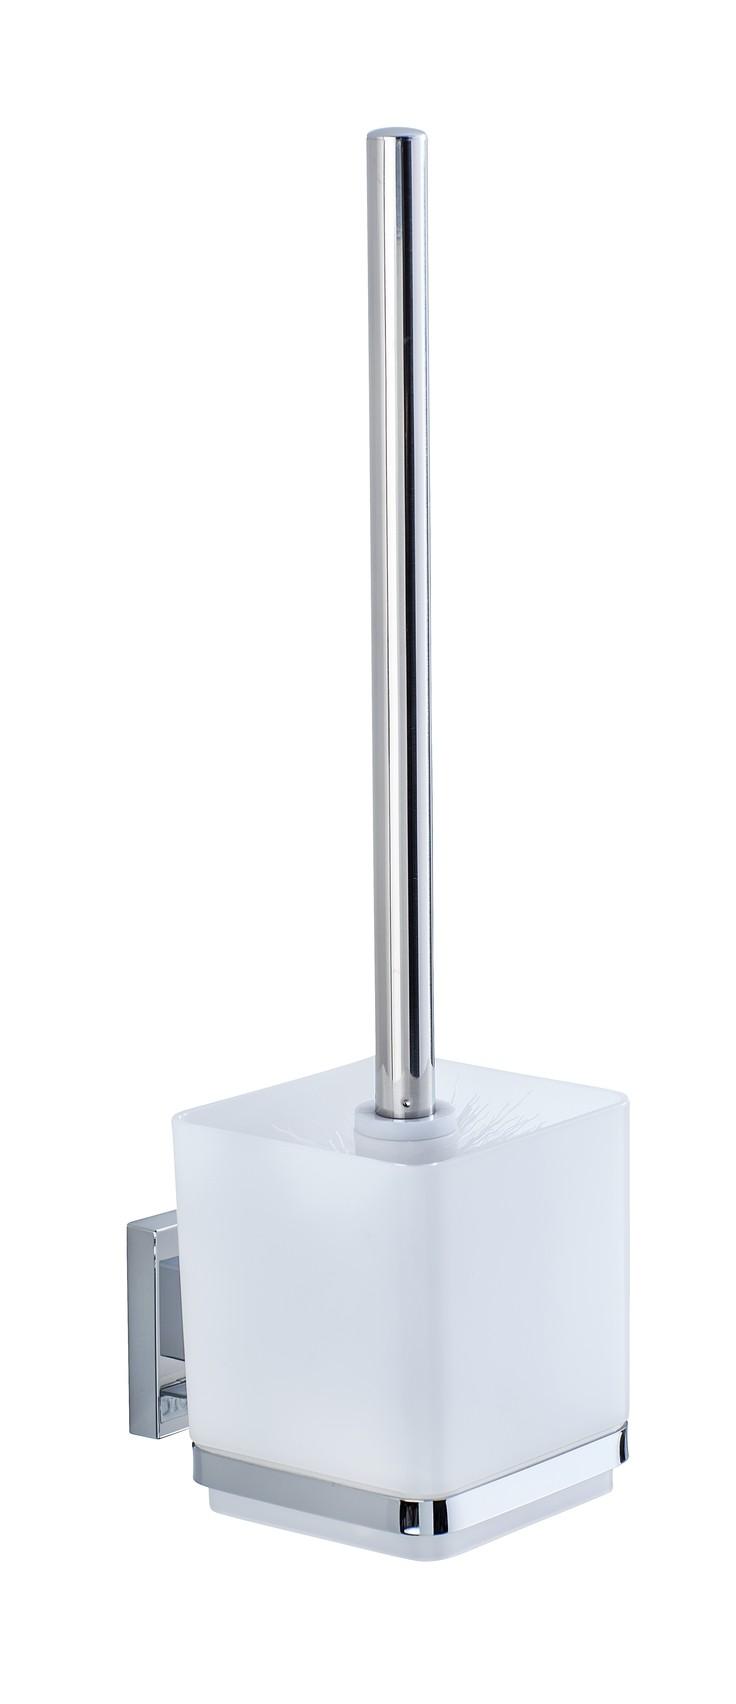 Wenko Vacuum-Loc® WC-Garnitur Quadro, Edelstahl, Befestigen ohne bohren